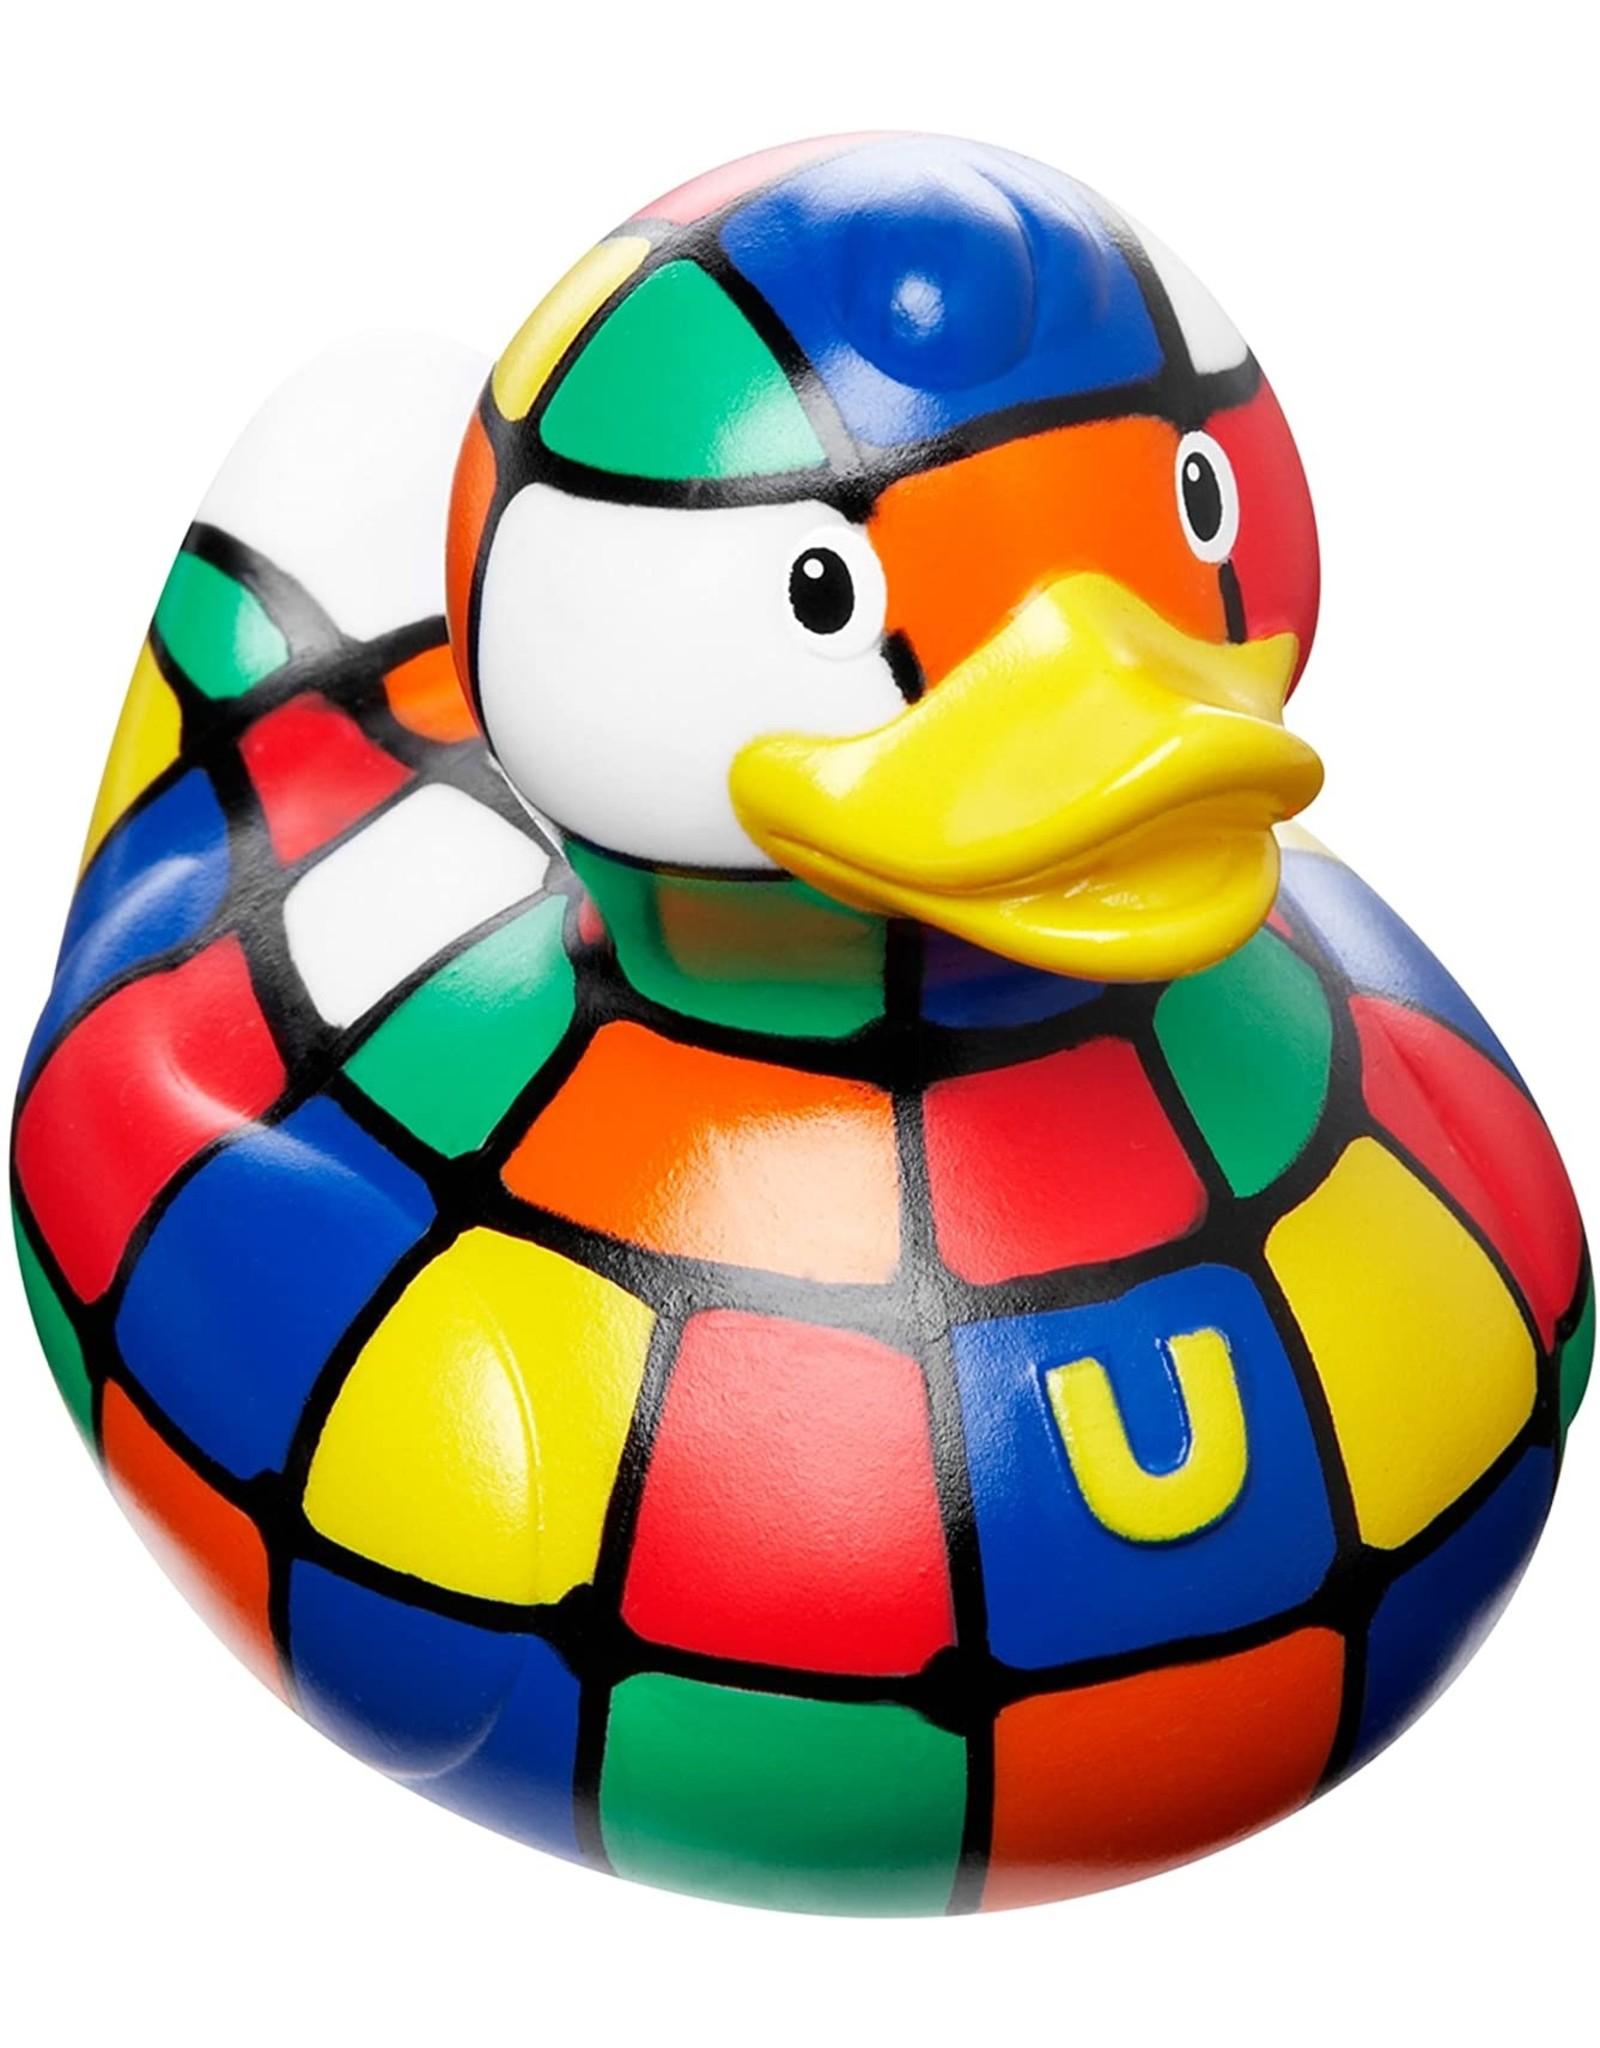 80's Cube Rubber Duck